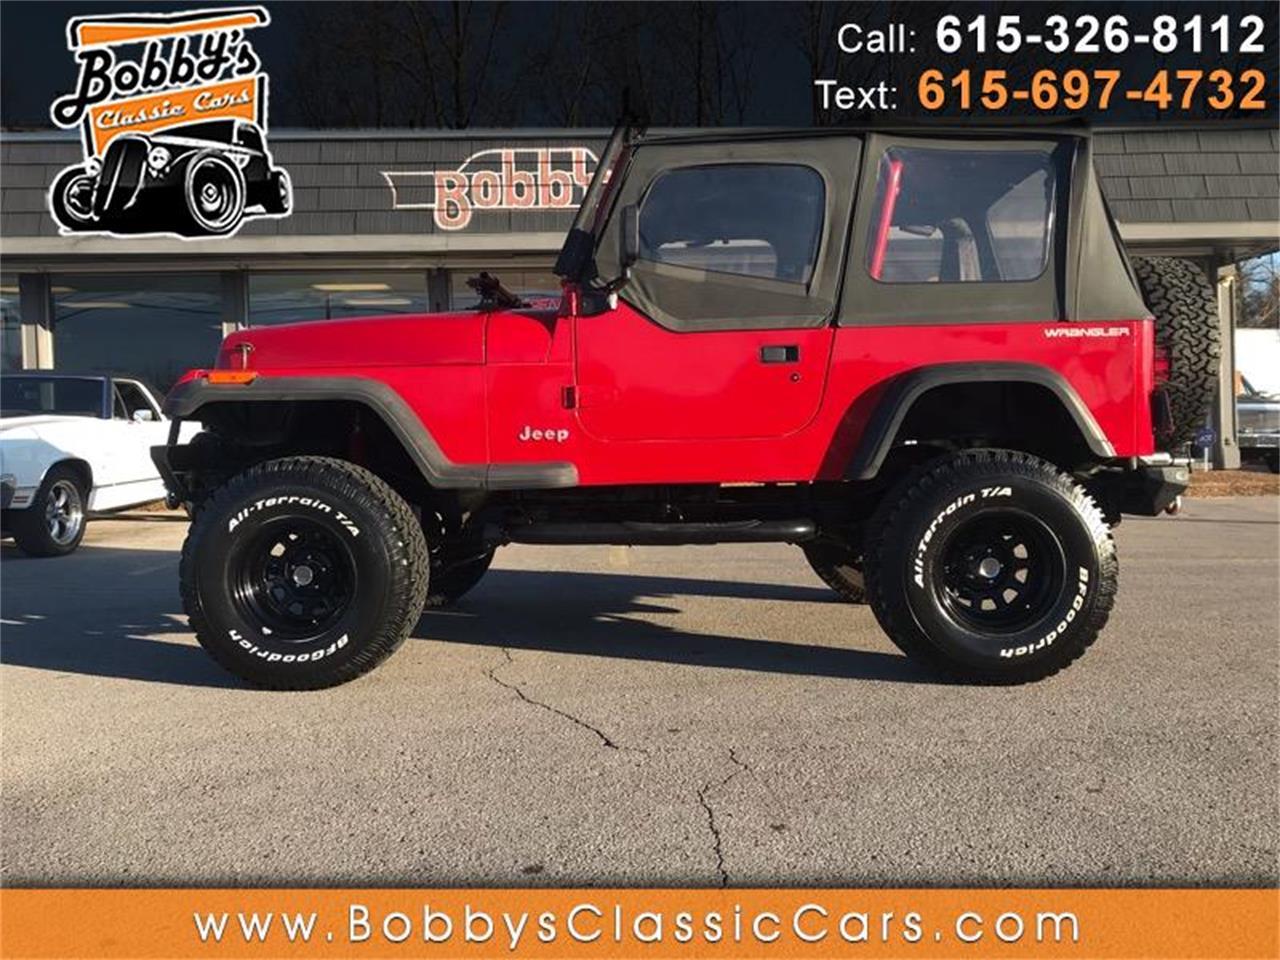 0c3af764 1994 Jeep Wrangler for Sale | ClassicCars.com | CC-1201956